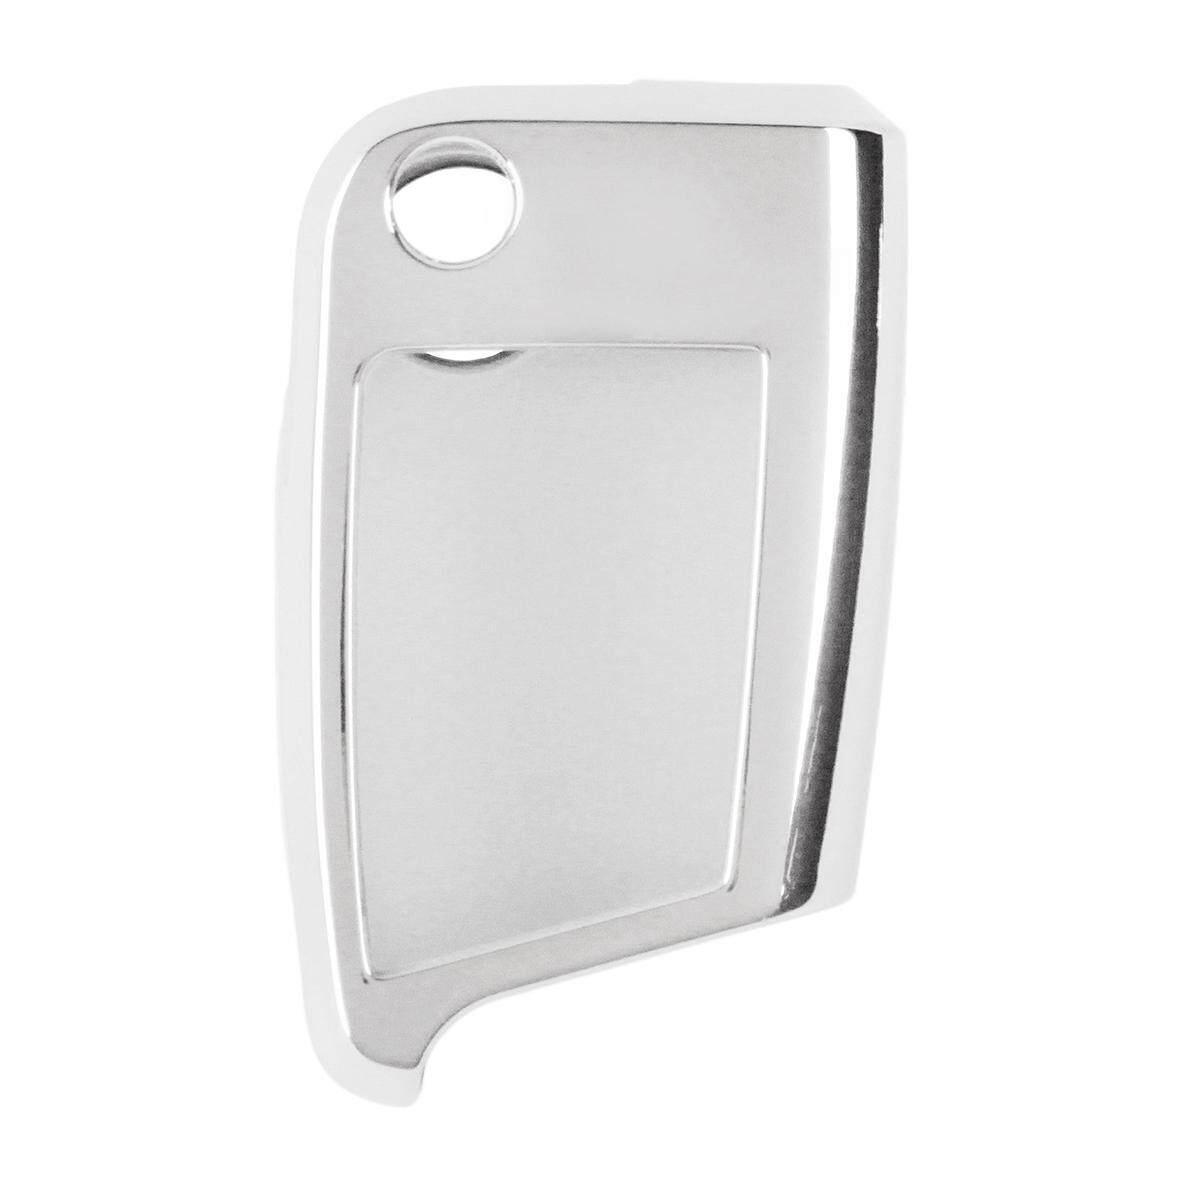 New TPU Remote Protect Key Cover Case Shell For VW TIGUAN Golf Skoda Octavia (Silver)